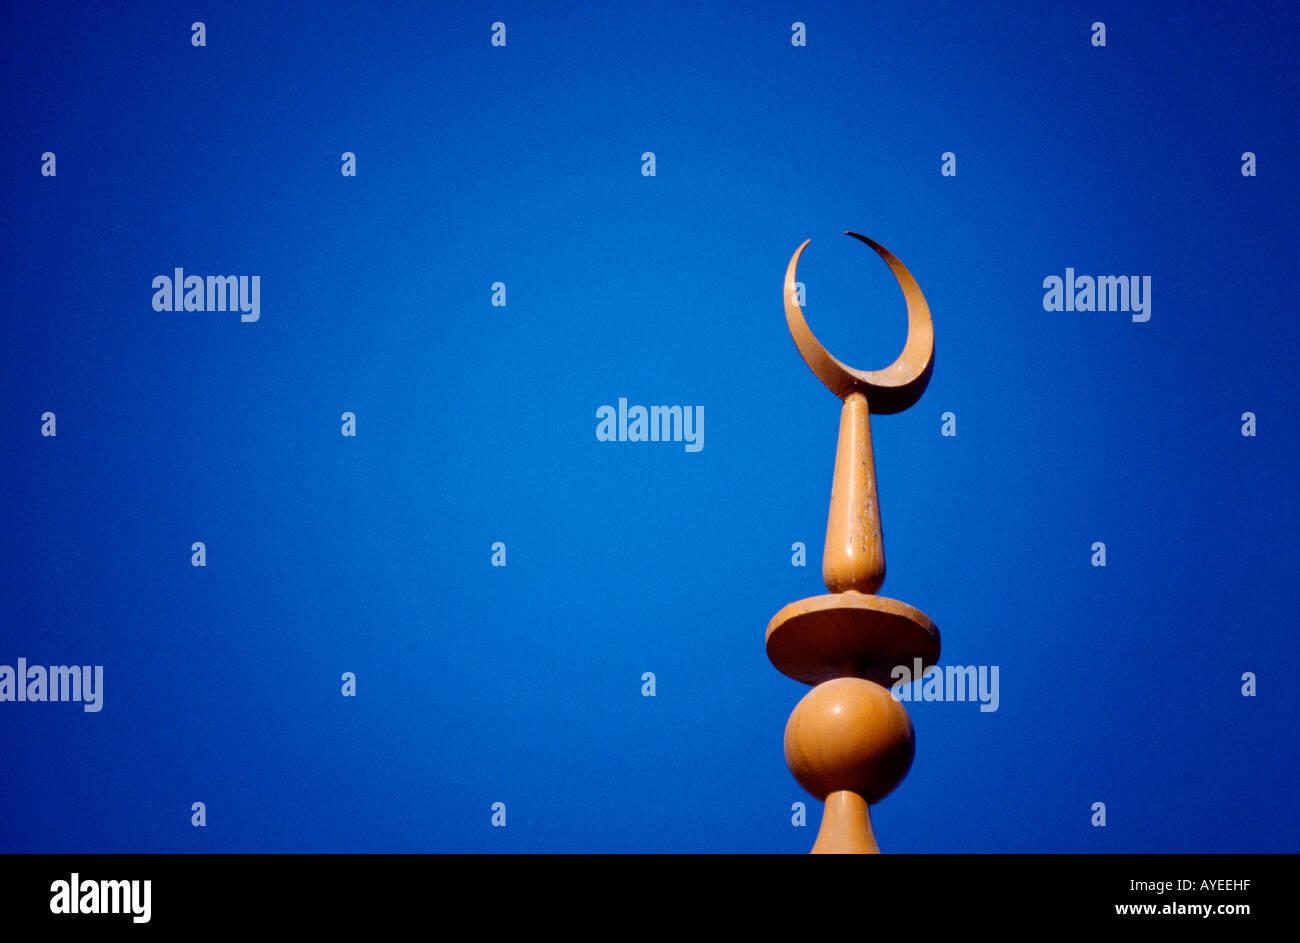 Abu Dhabi VAE Moschee Minarett mit Mondsichel-Symbol des Islam Stockbild